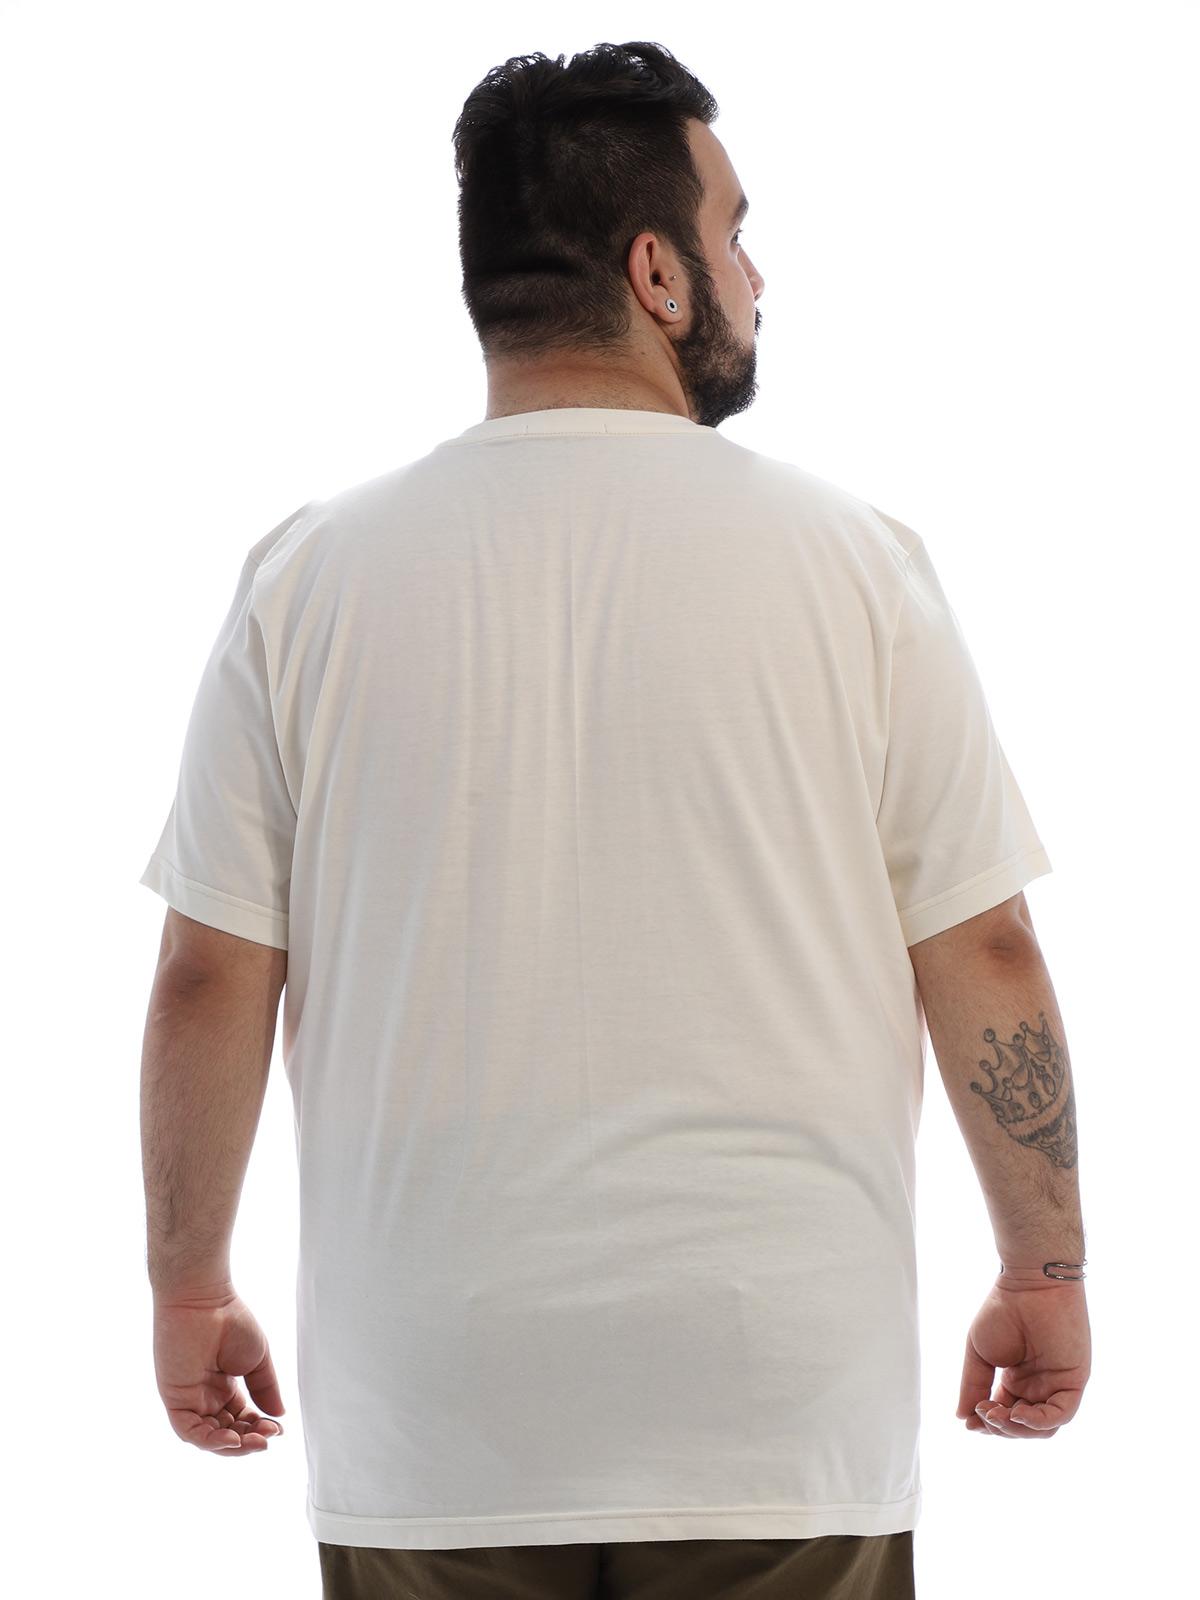 Camiseta Plus Size Masculina Algodão Anistia Caktos Marfim